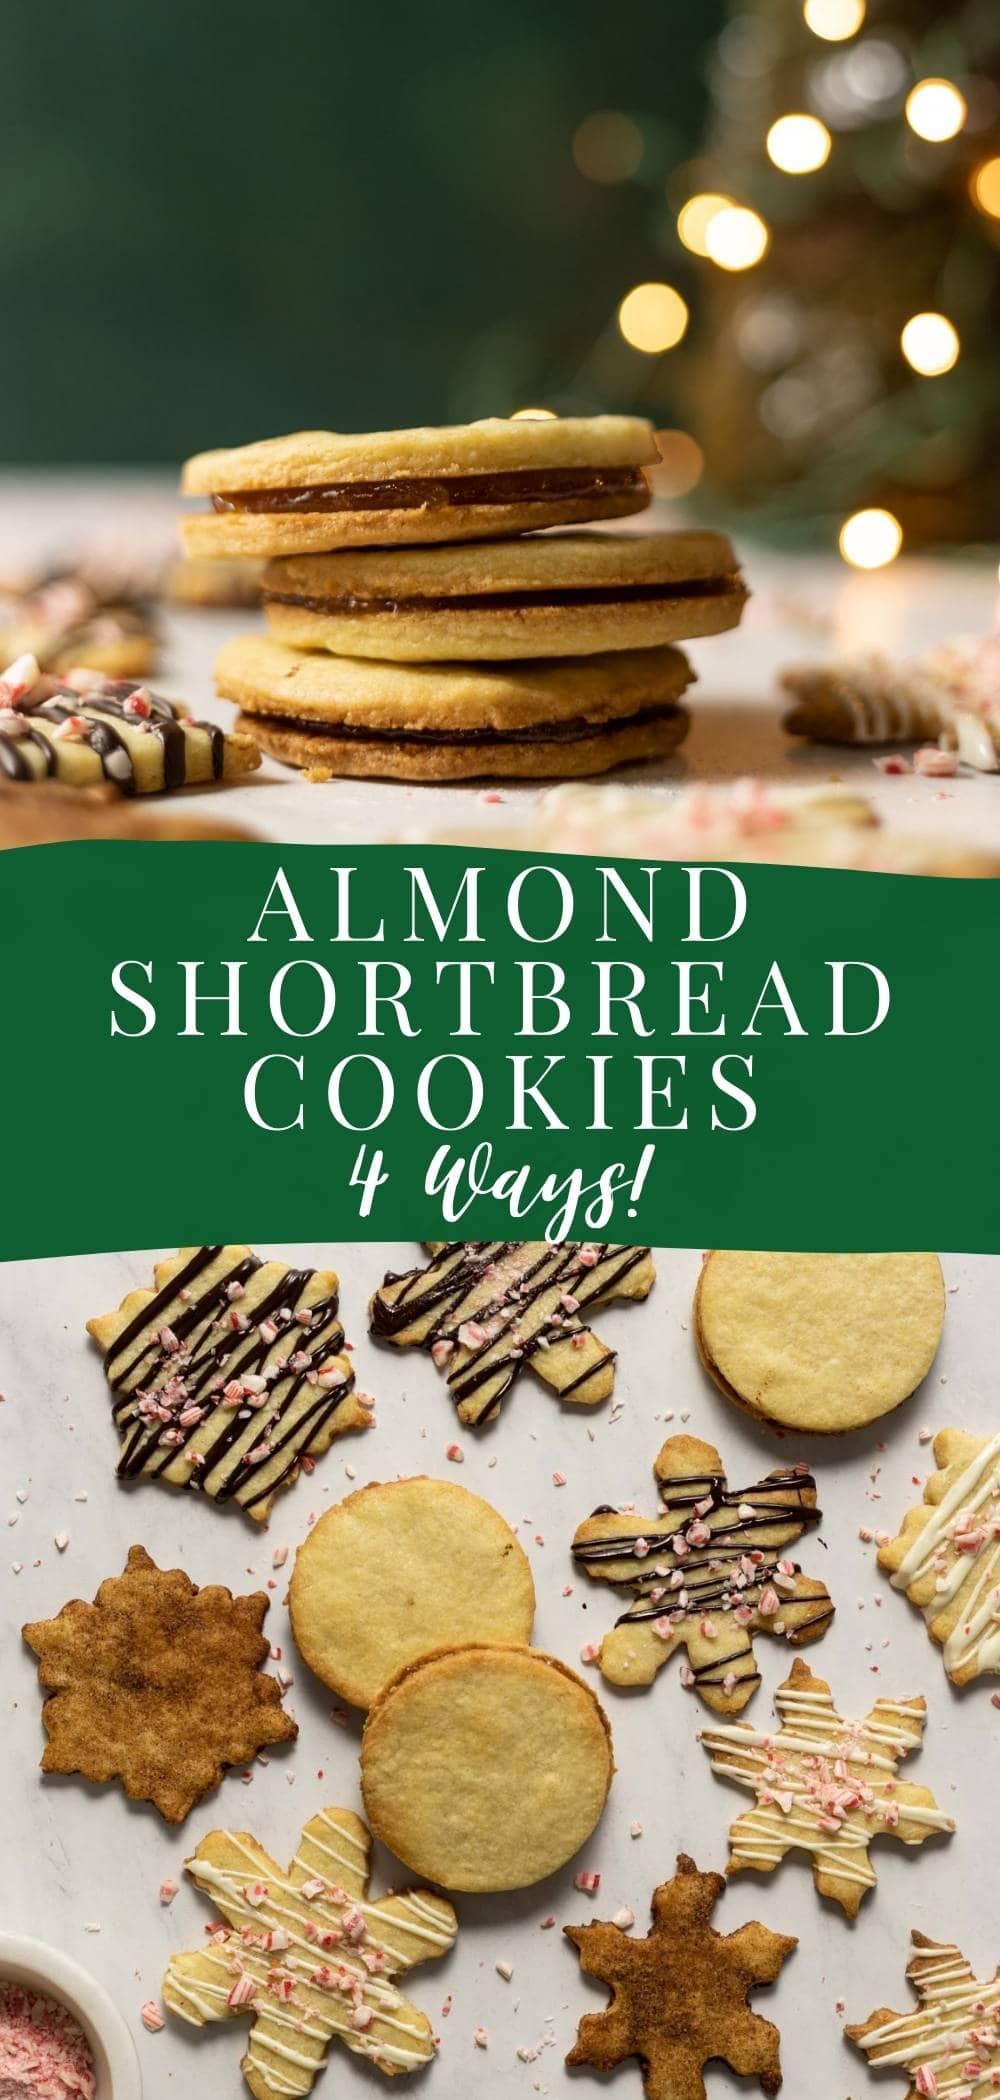 Delectable almond shortbread cookies 4 ways! via @bessiebakes